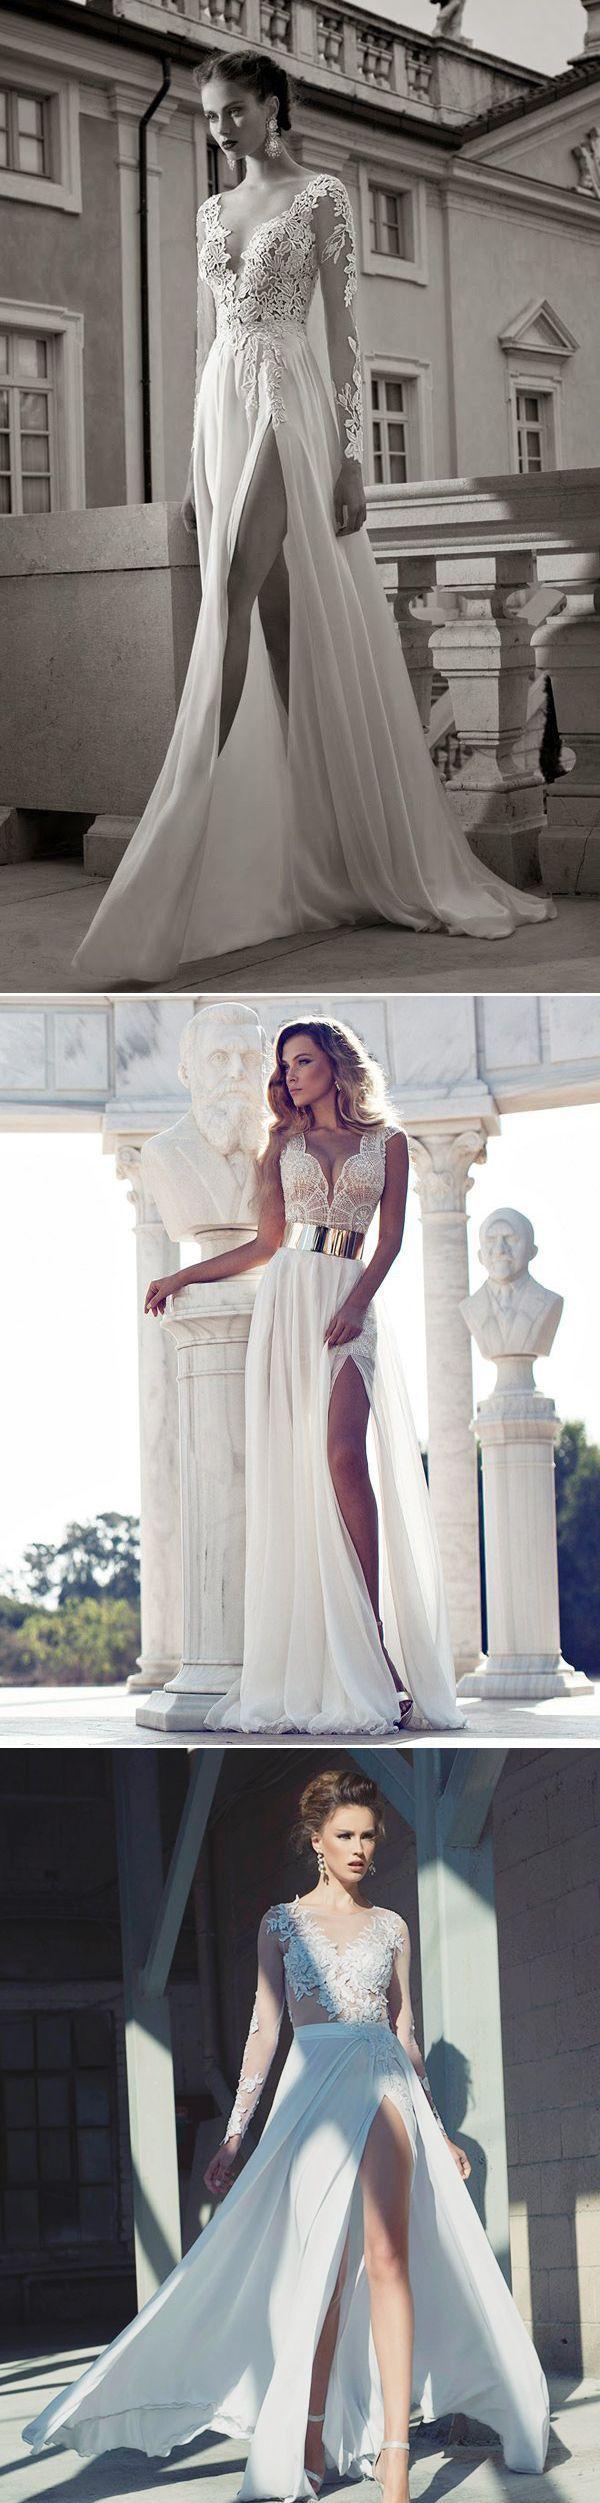 Sexy & Sophisticated High Slit Wedding Dresses 2016 - Deer Pearl Flowers